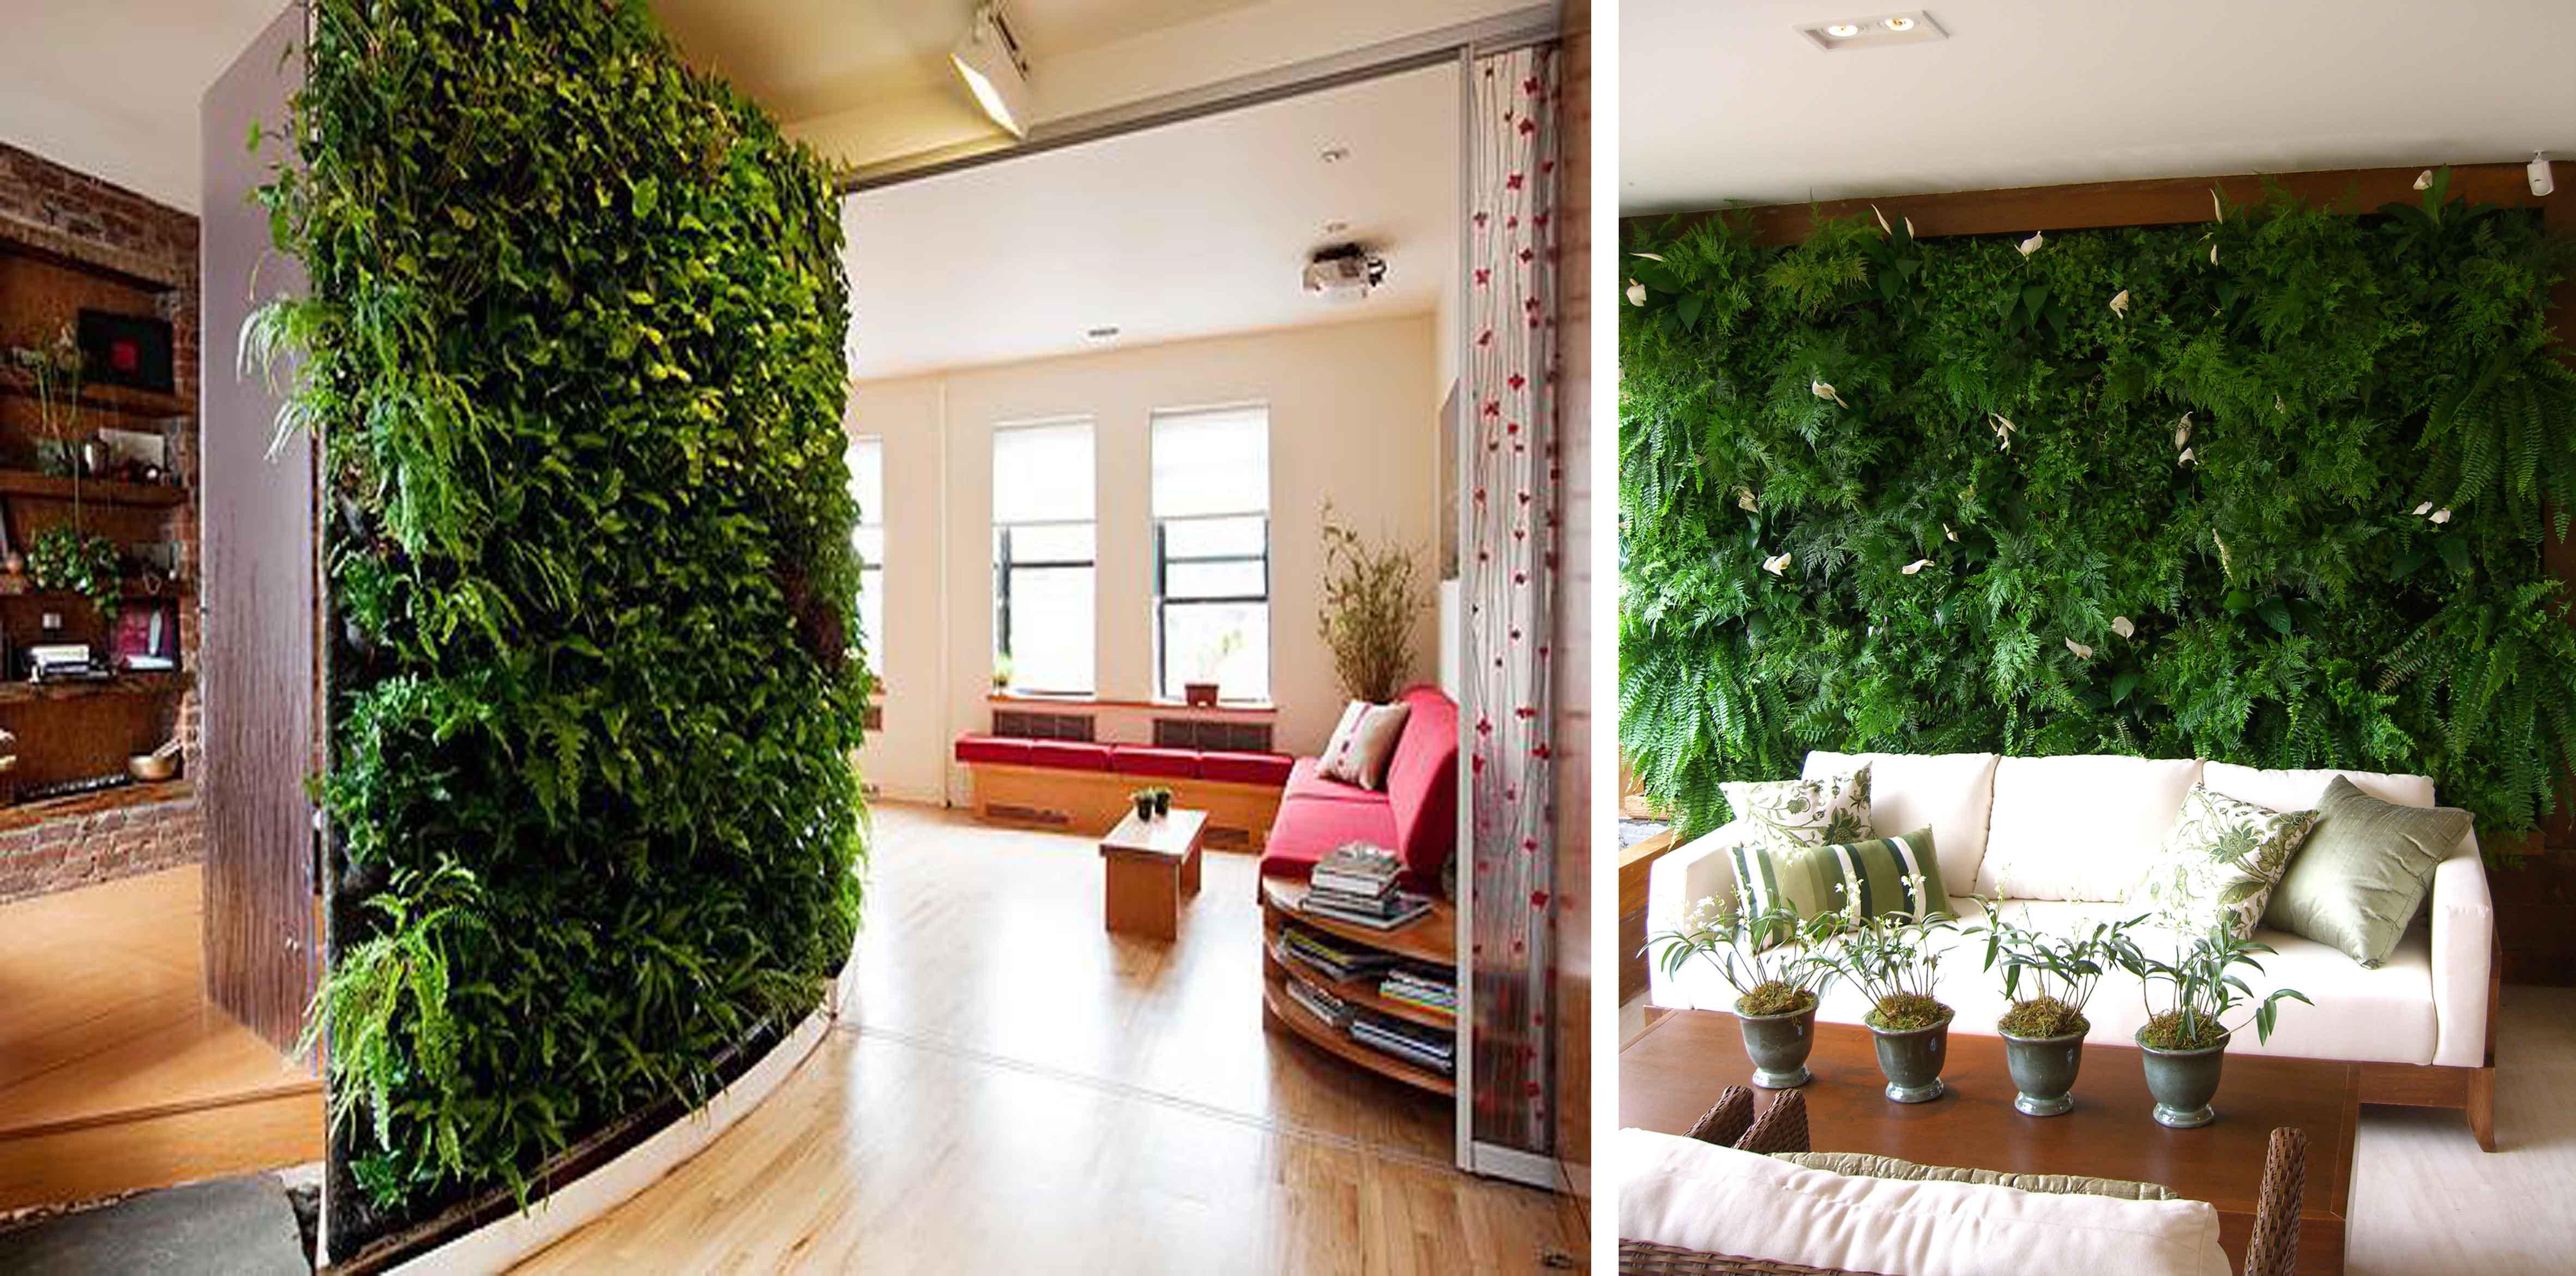 jardim vertical externo : jardim vertical externo:Jardim Vertical